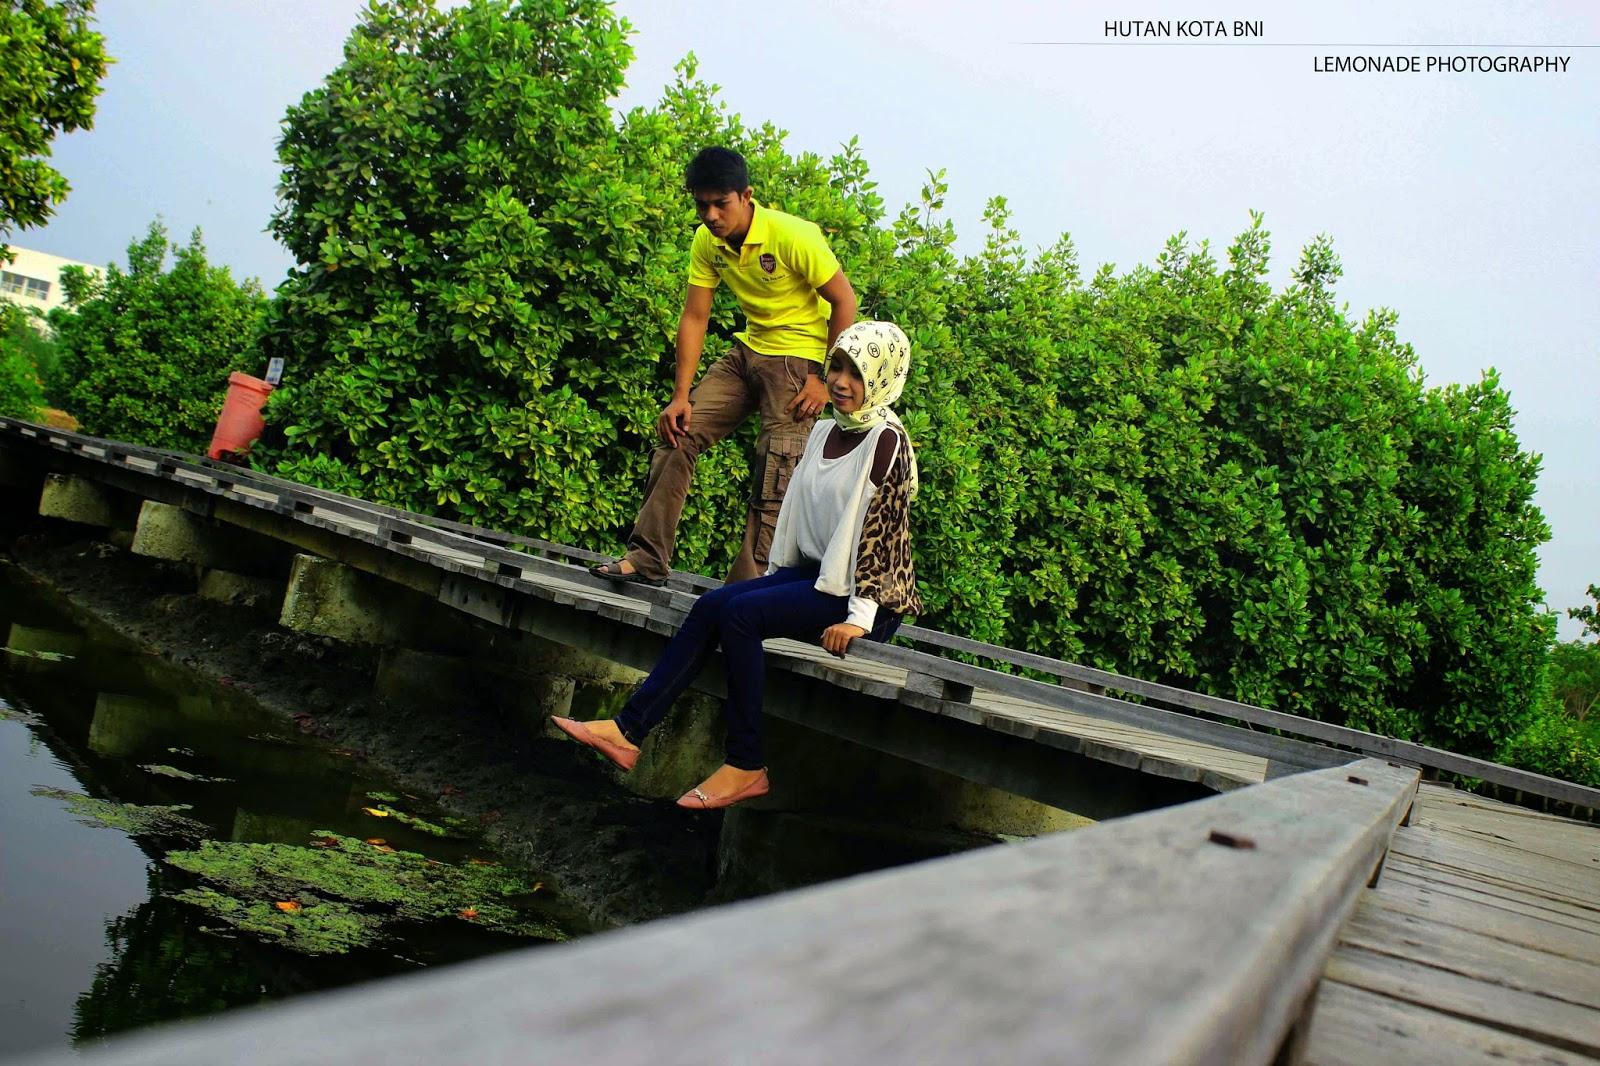 Le Ra Hutan Kota Bni Tibang Banda Aceh